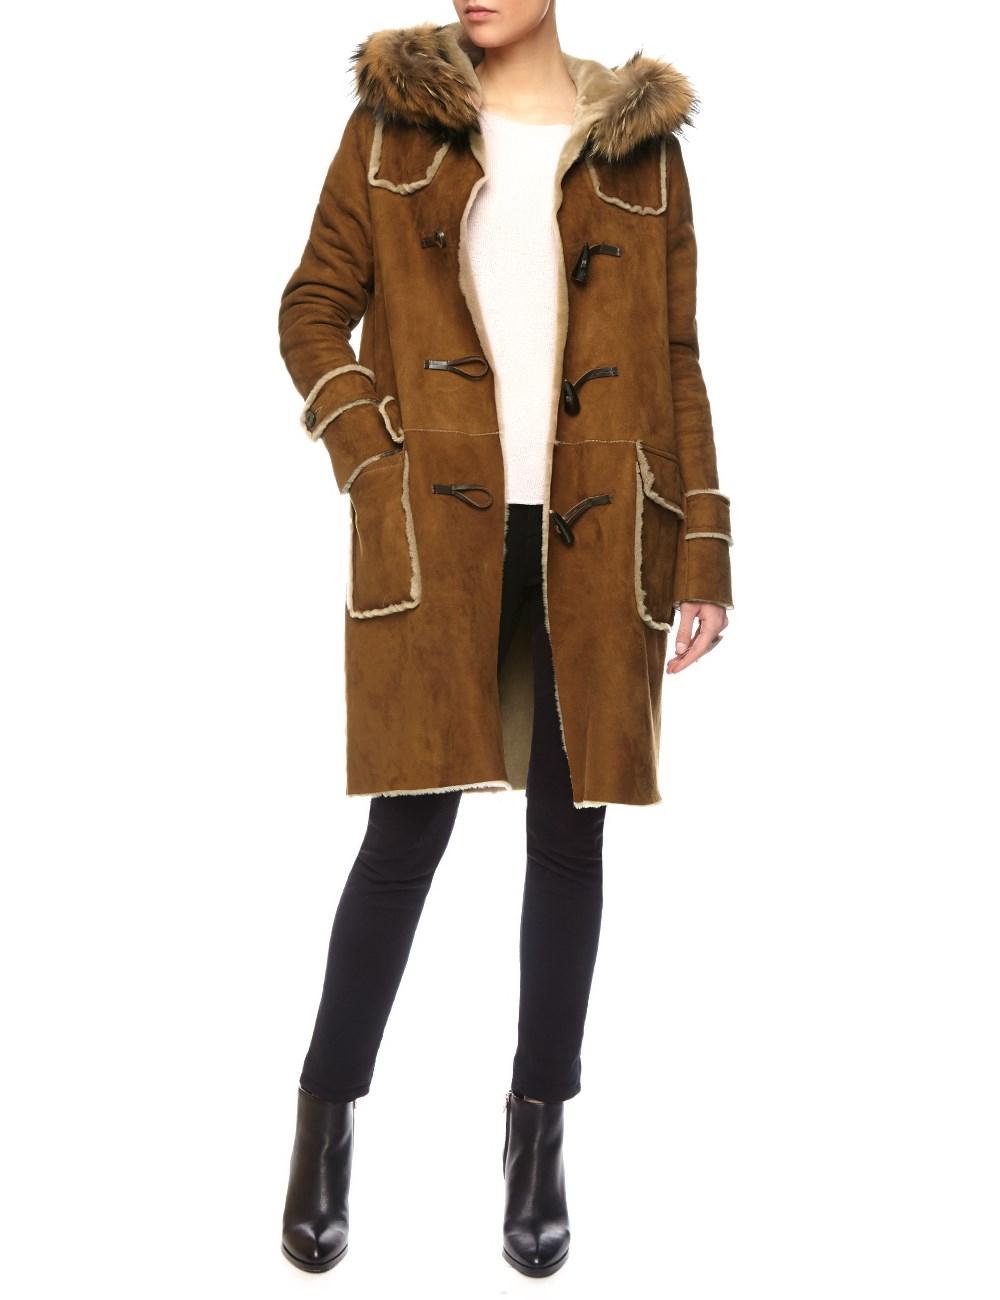 Dlux Biscuit Merino Shearling Duffle Coat in Brown | Lyst